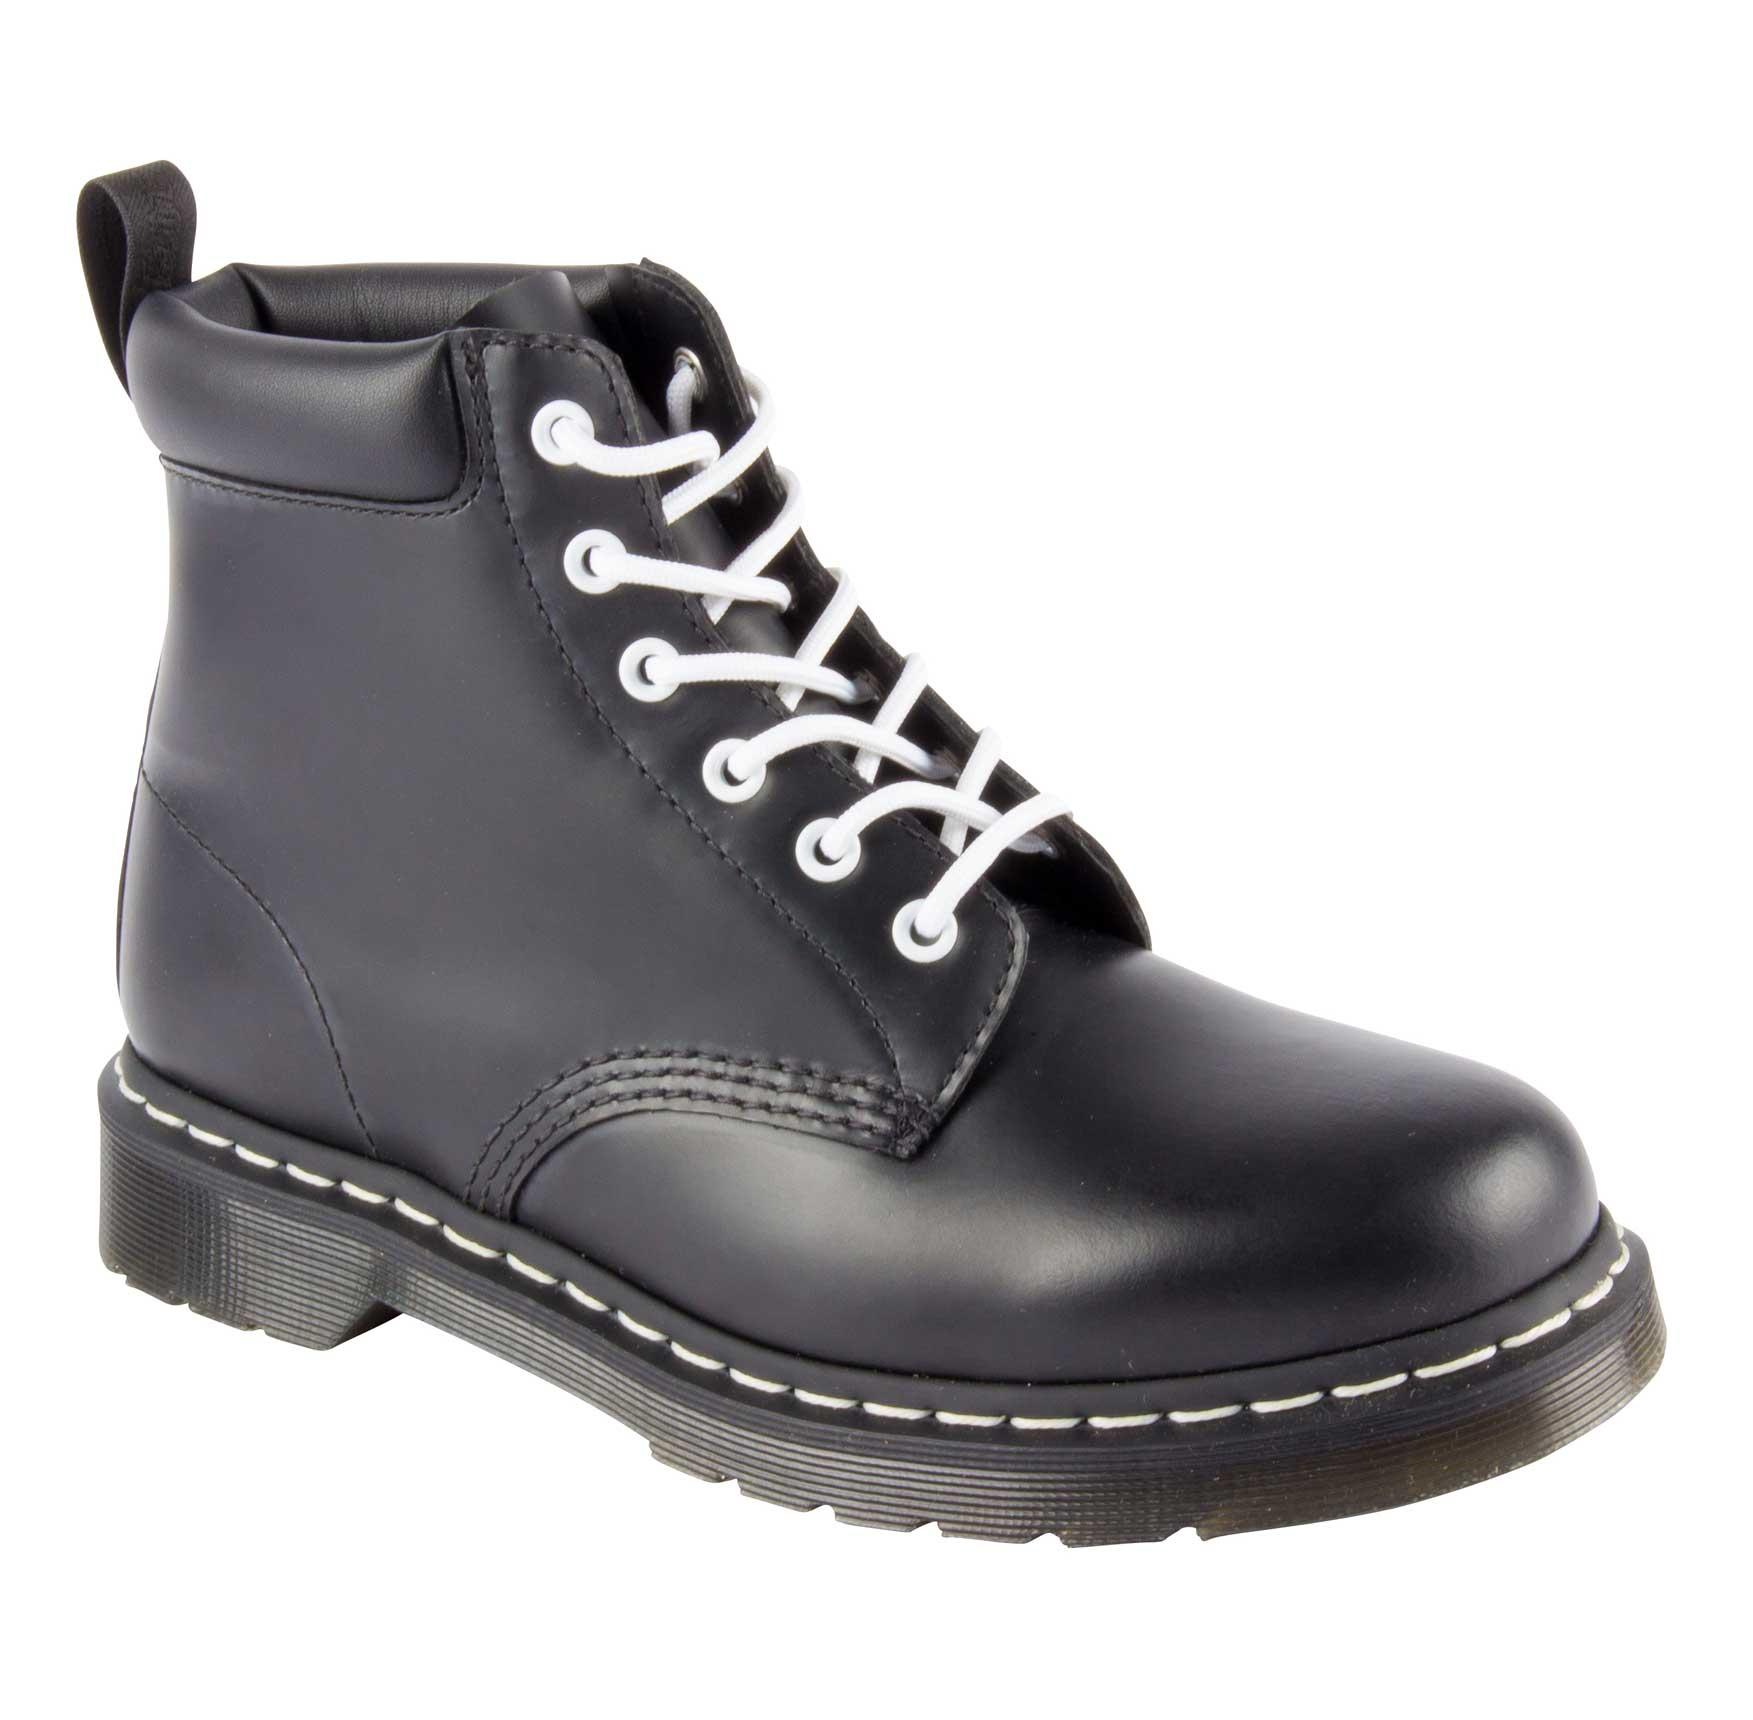 נעלי Dr. Martens יוניסקס - דגם 939 Black Smooth